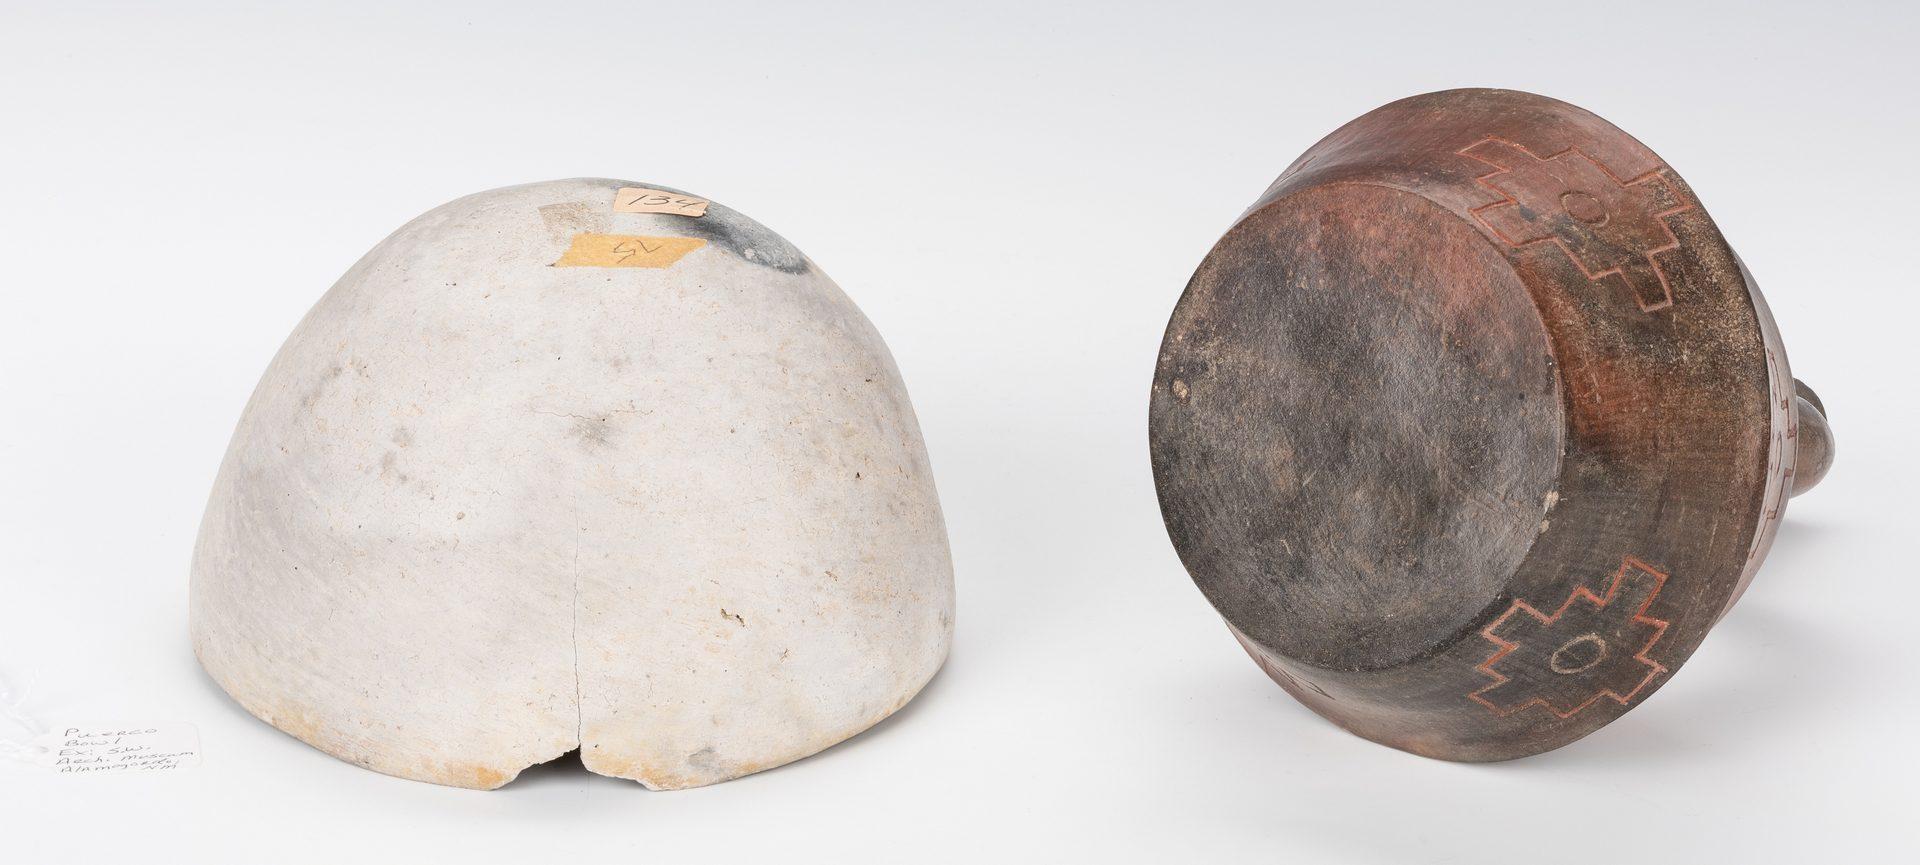 Lot 679: Anasazi, Peruvian, & Pre Columbian Vessels, Total 10